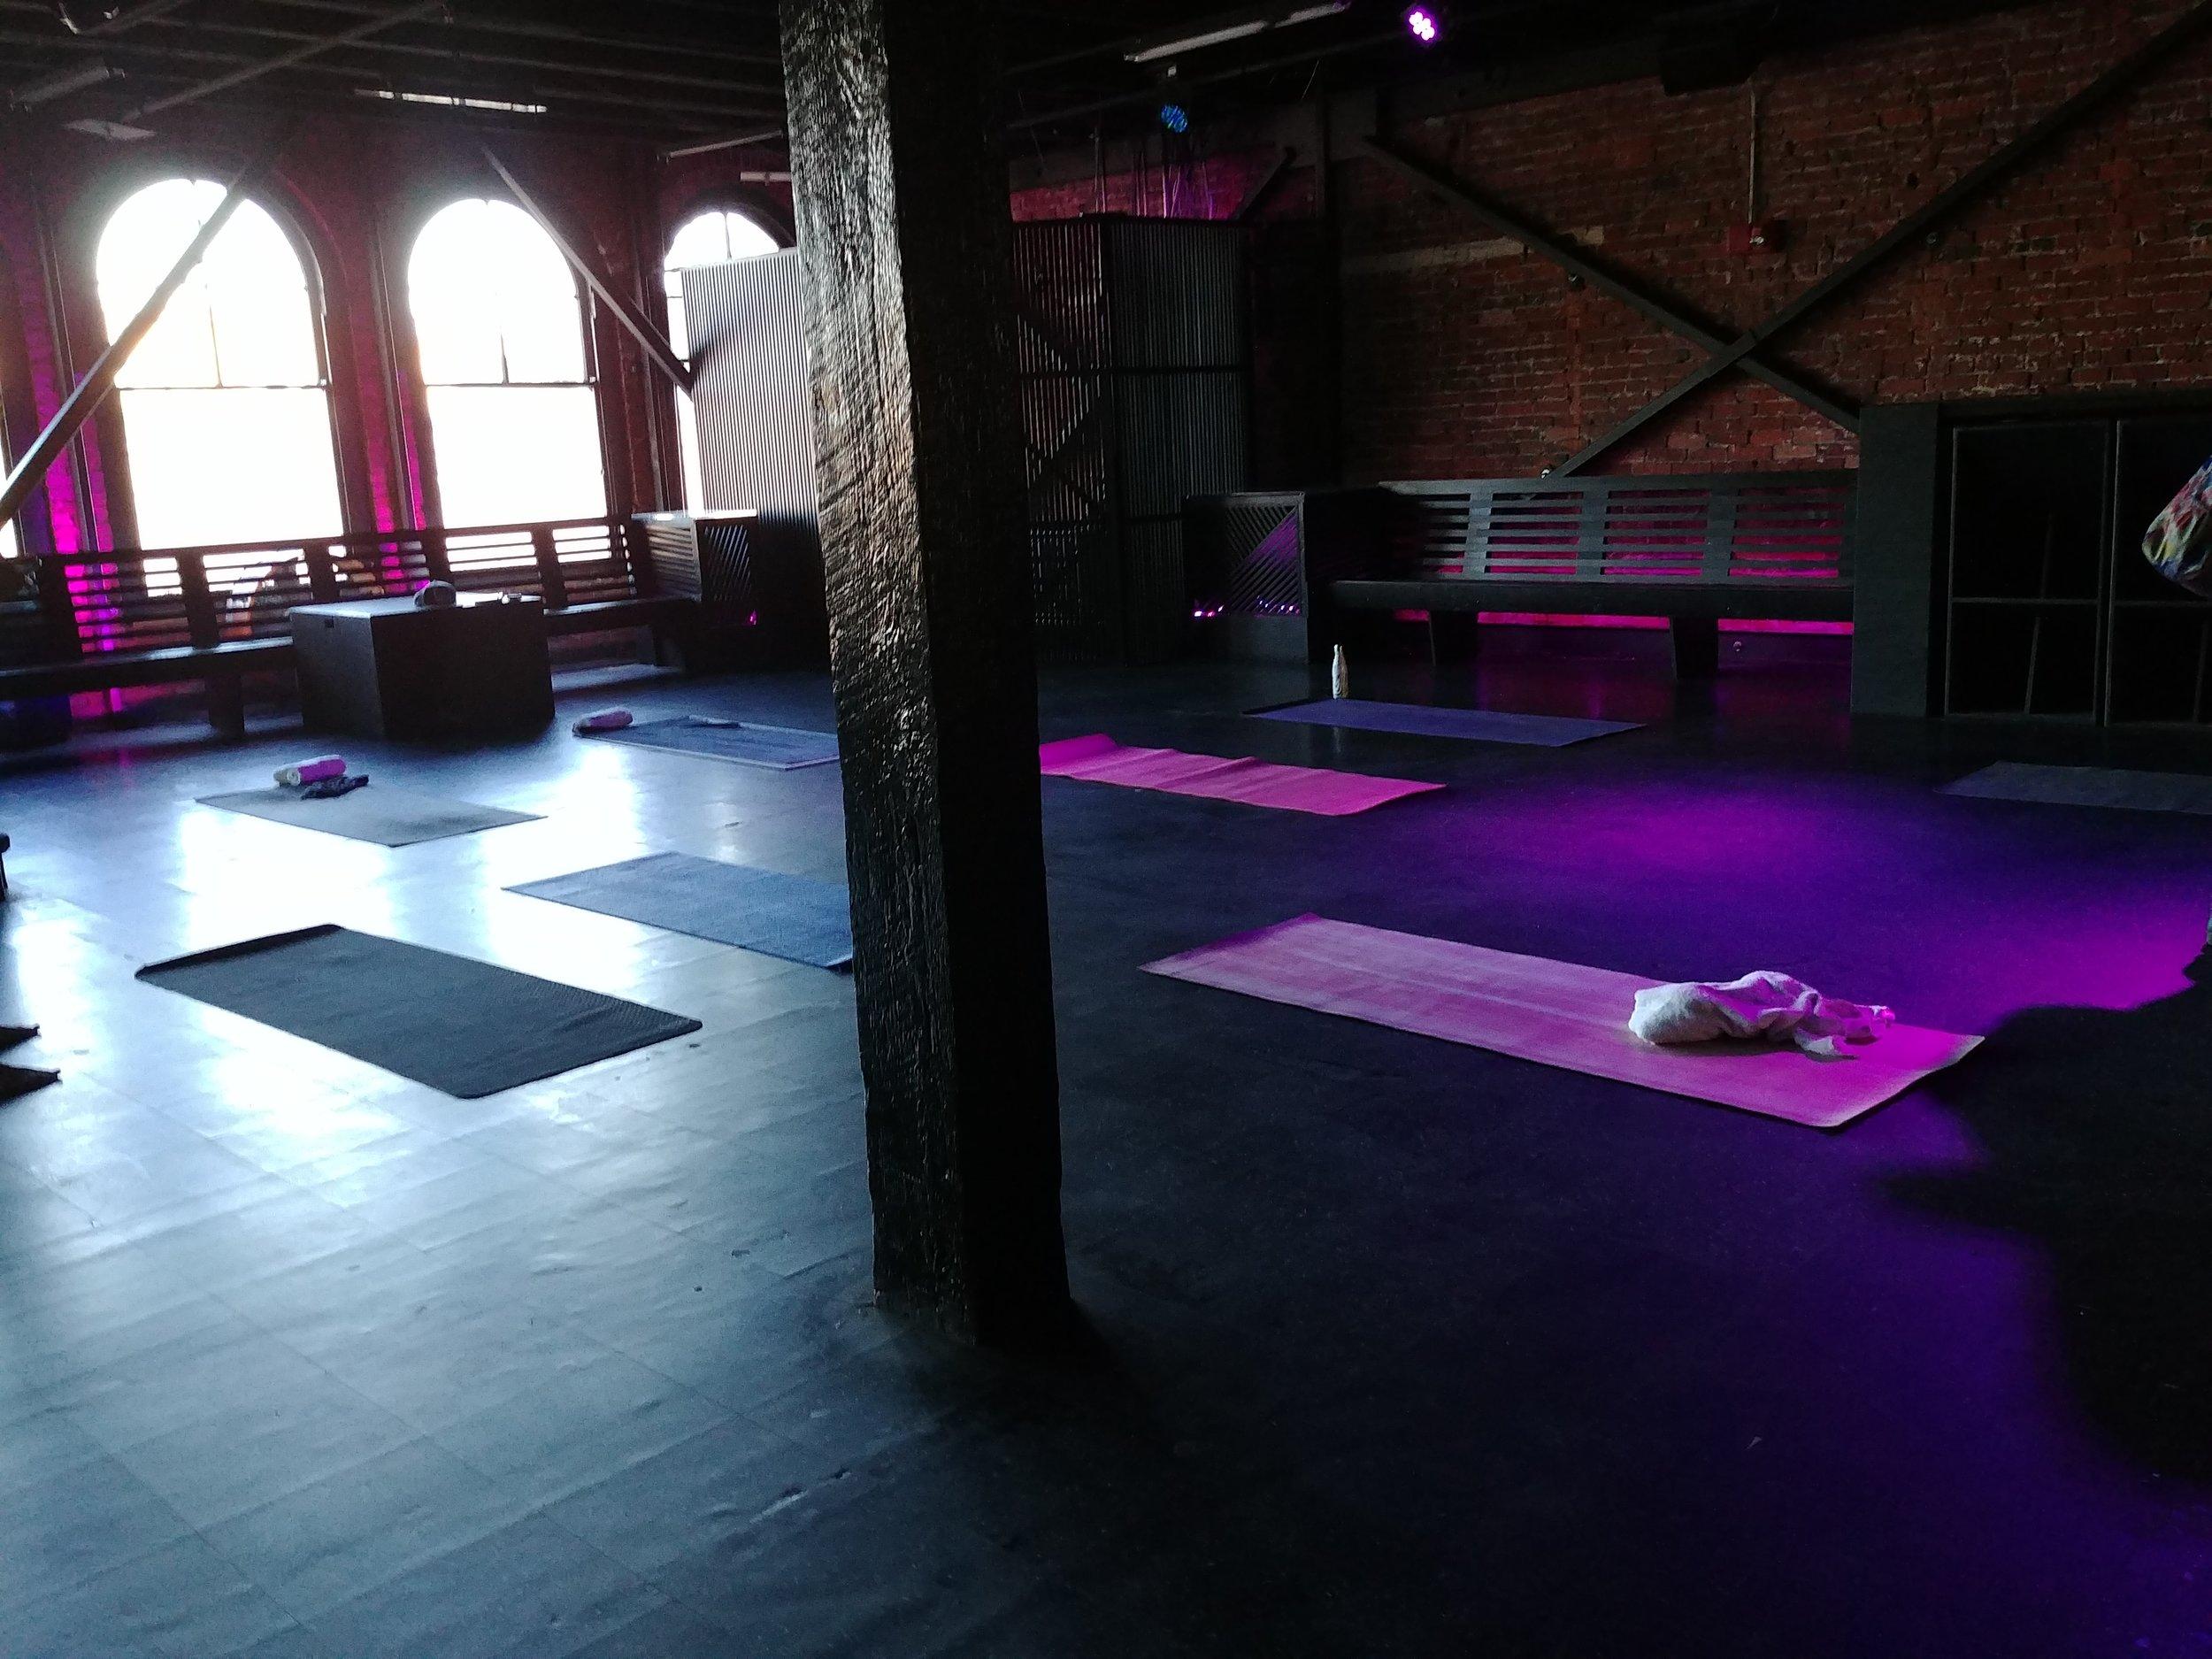 Fuel Yoga Workouts Downtown Portland Heated  Yoga Power Vinyasa 826 SW 2nd Ave Portland Oregon 97204 971-213-3835 Healthy Hour 6.jpg